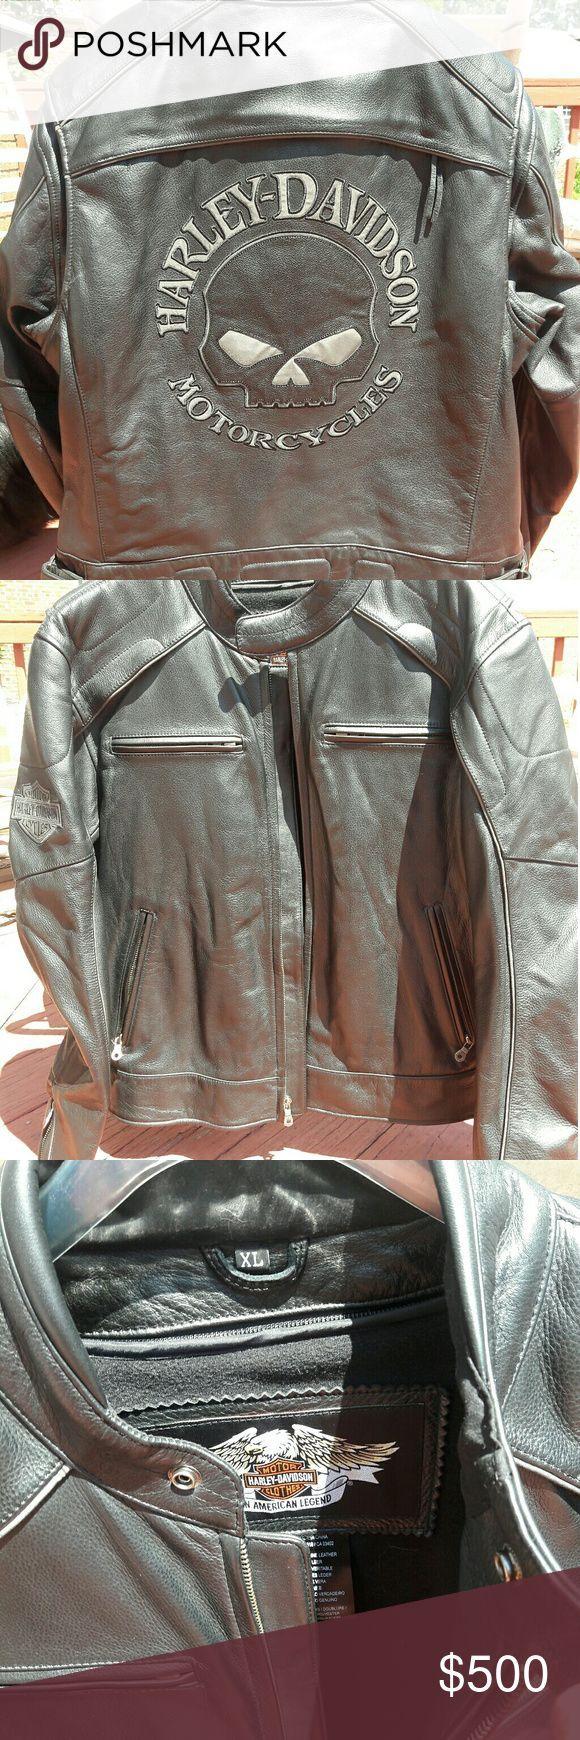 Awesome Harley Davidson Jackets NWOT HD Men's Leather Biker Jacket, XL New, never worn, black, Harley Davids... Check more at http://24shopme.gq/fashion/harley-davidson-jackets-nwot-hd-mens-leather-biker-jacket-xl-new-never-worn-black-harley-davids/